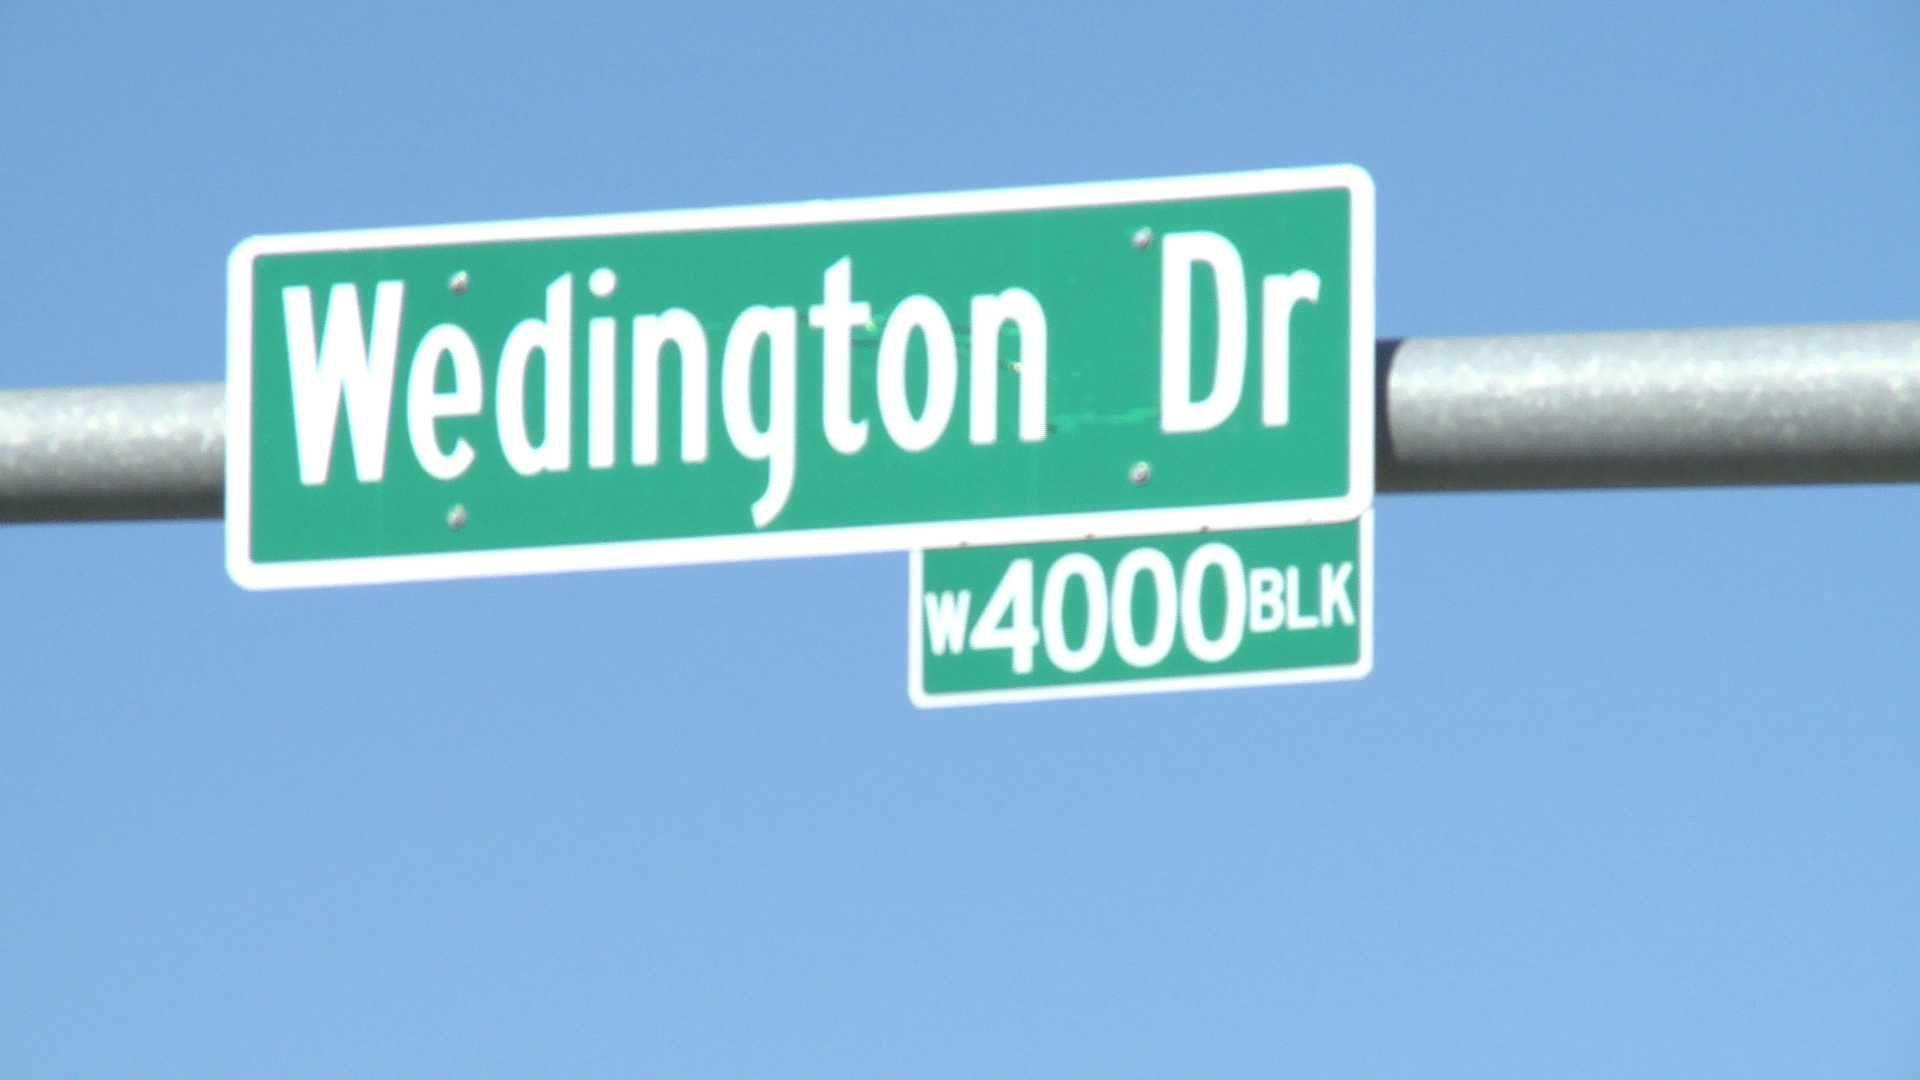 Wedington